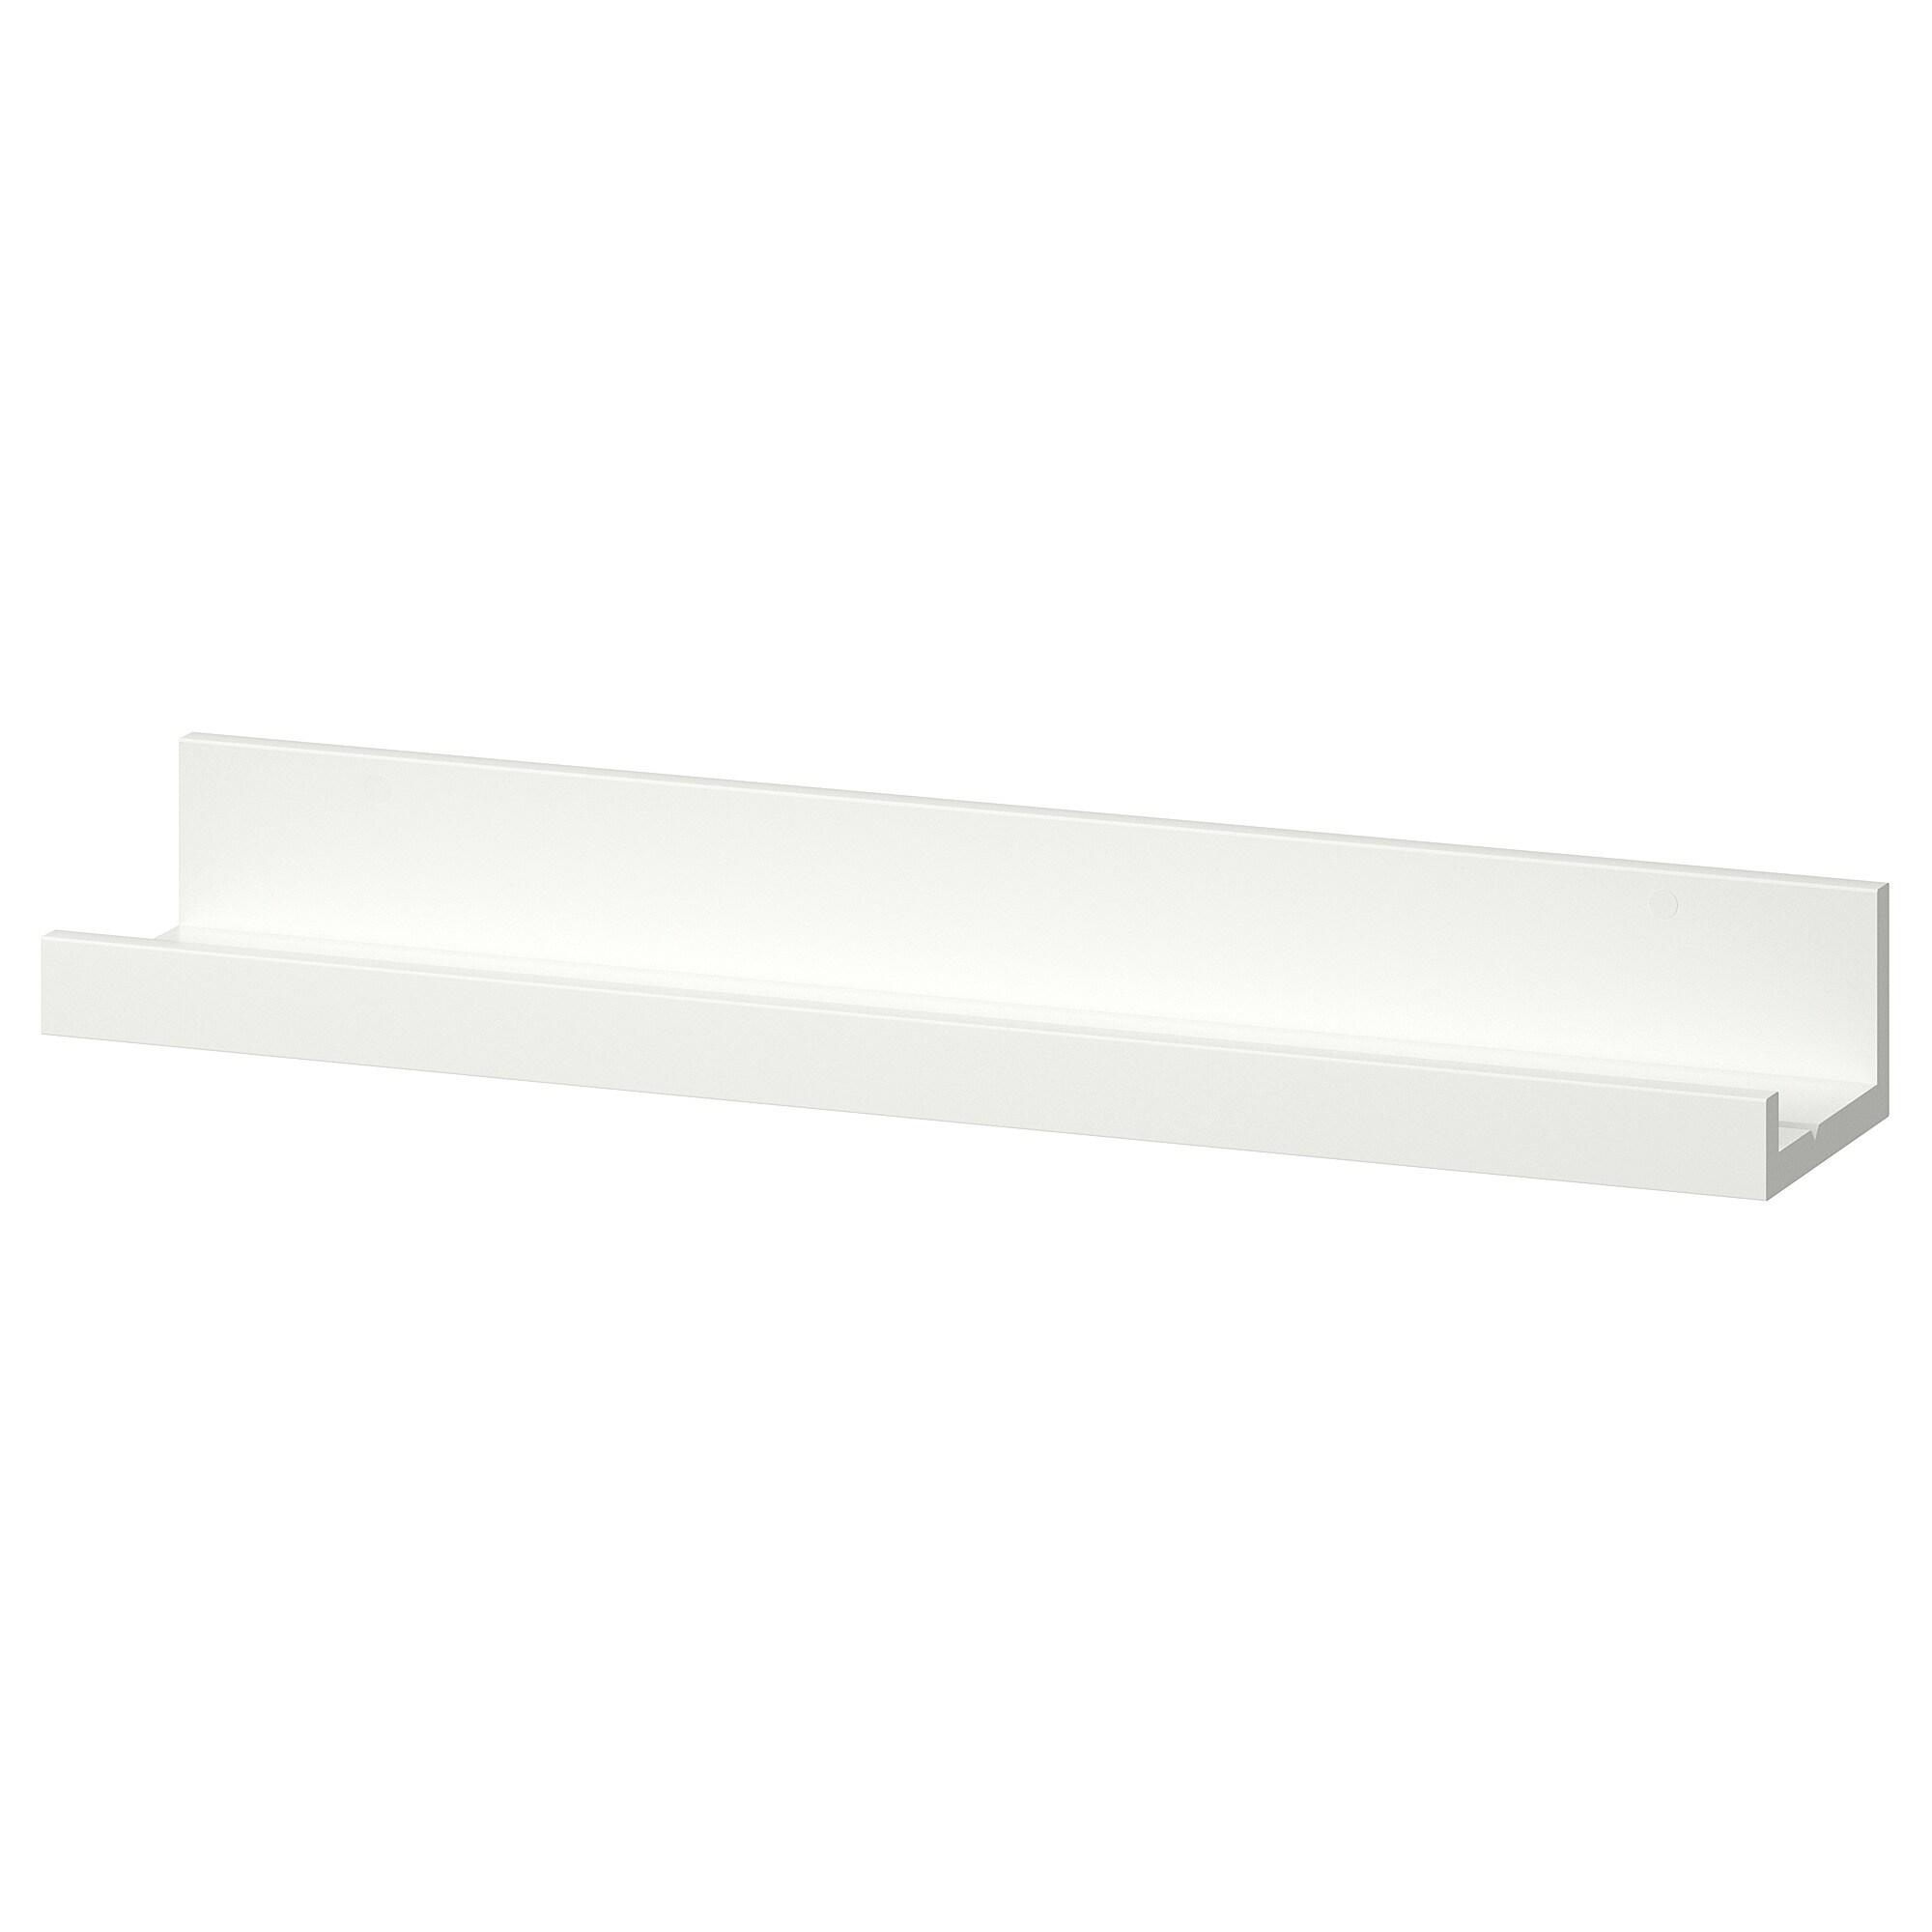 IKEA MOSSLANDA Bilderleiste